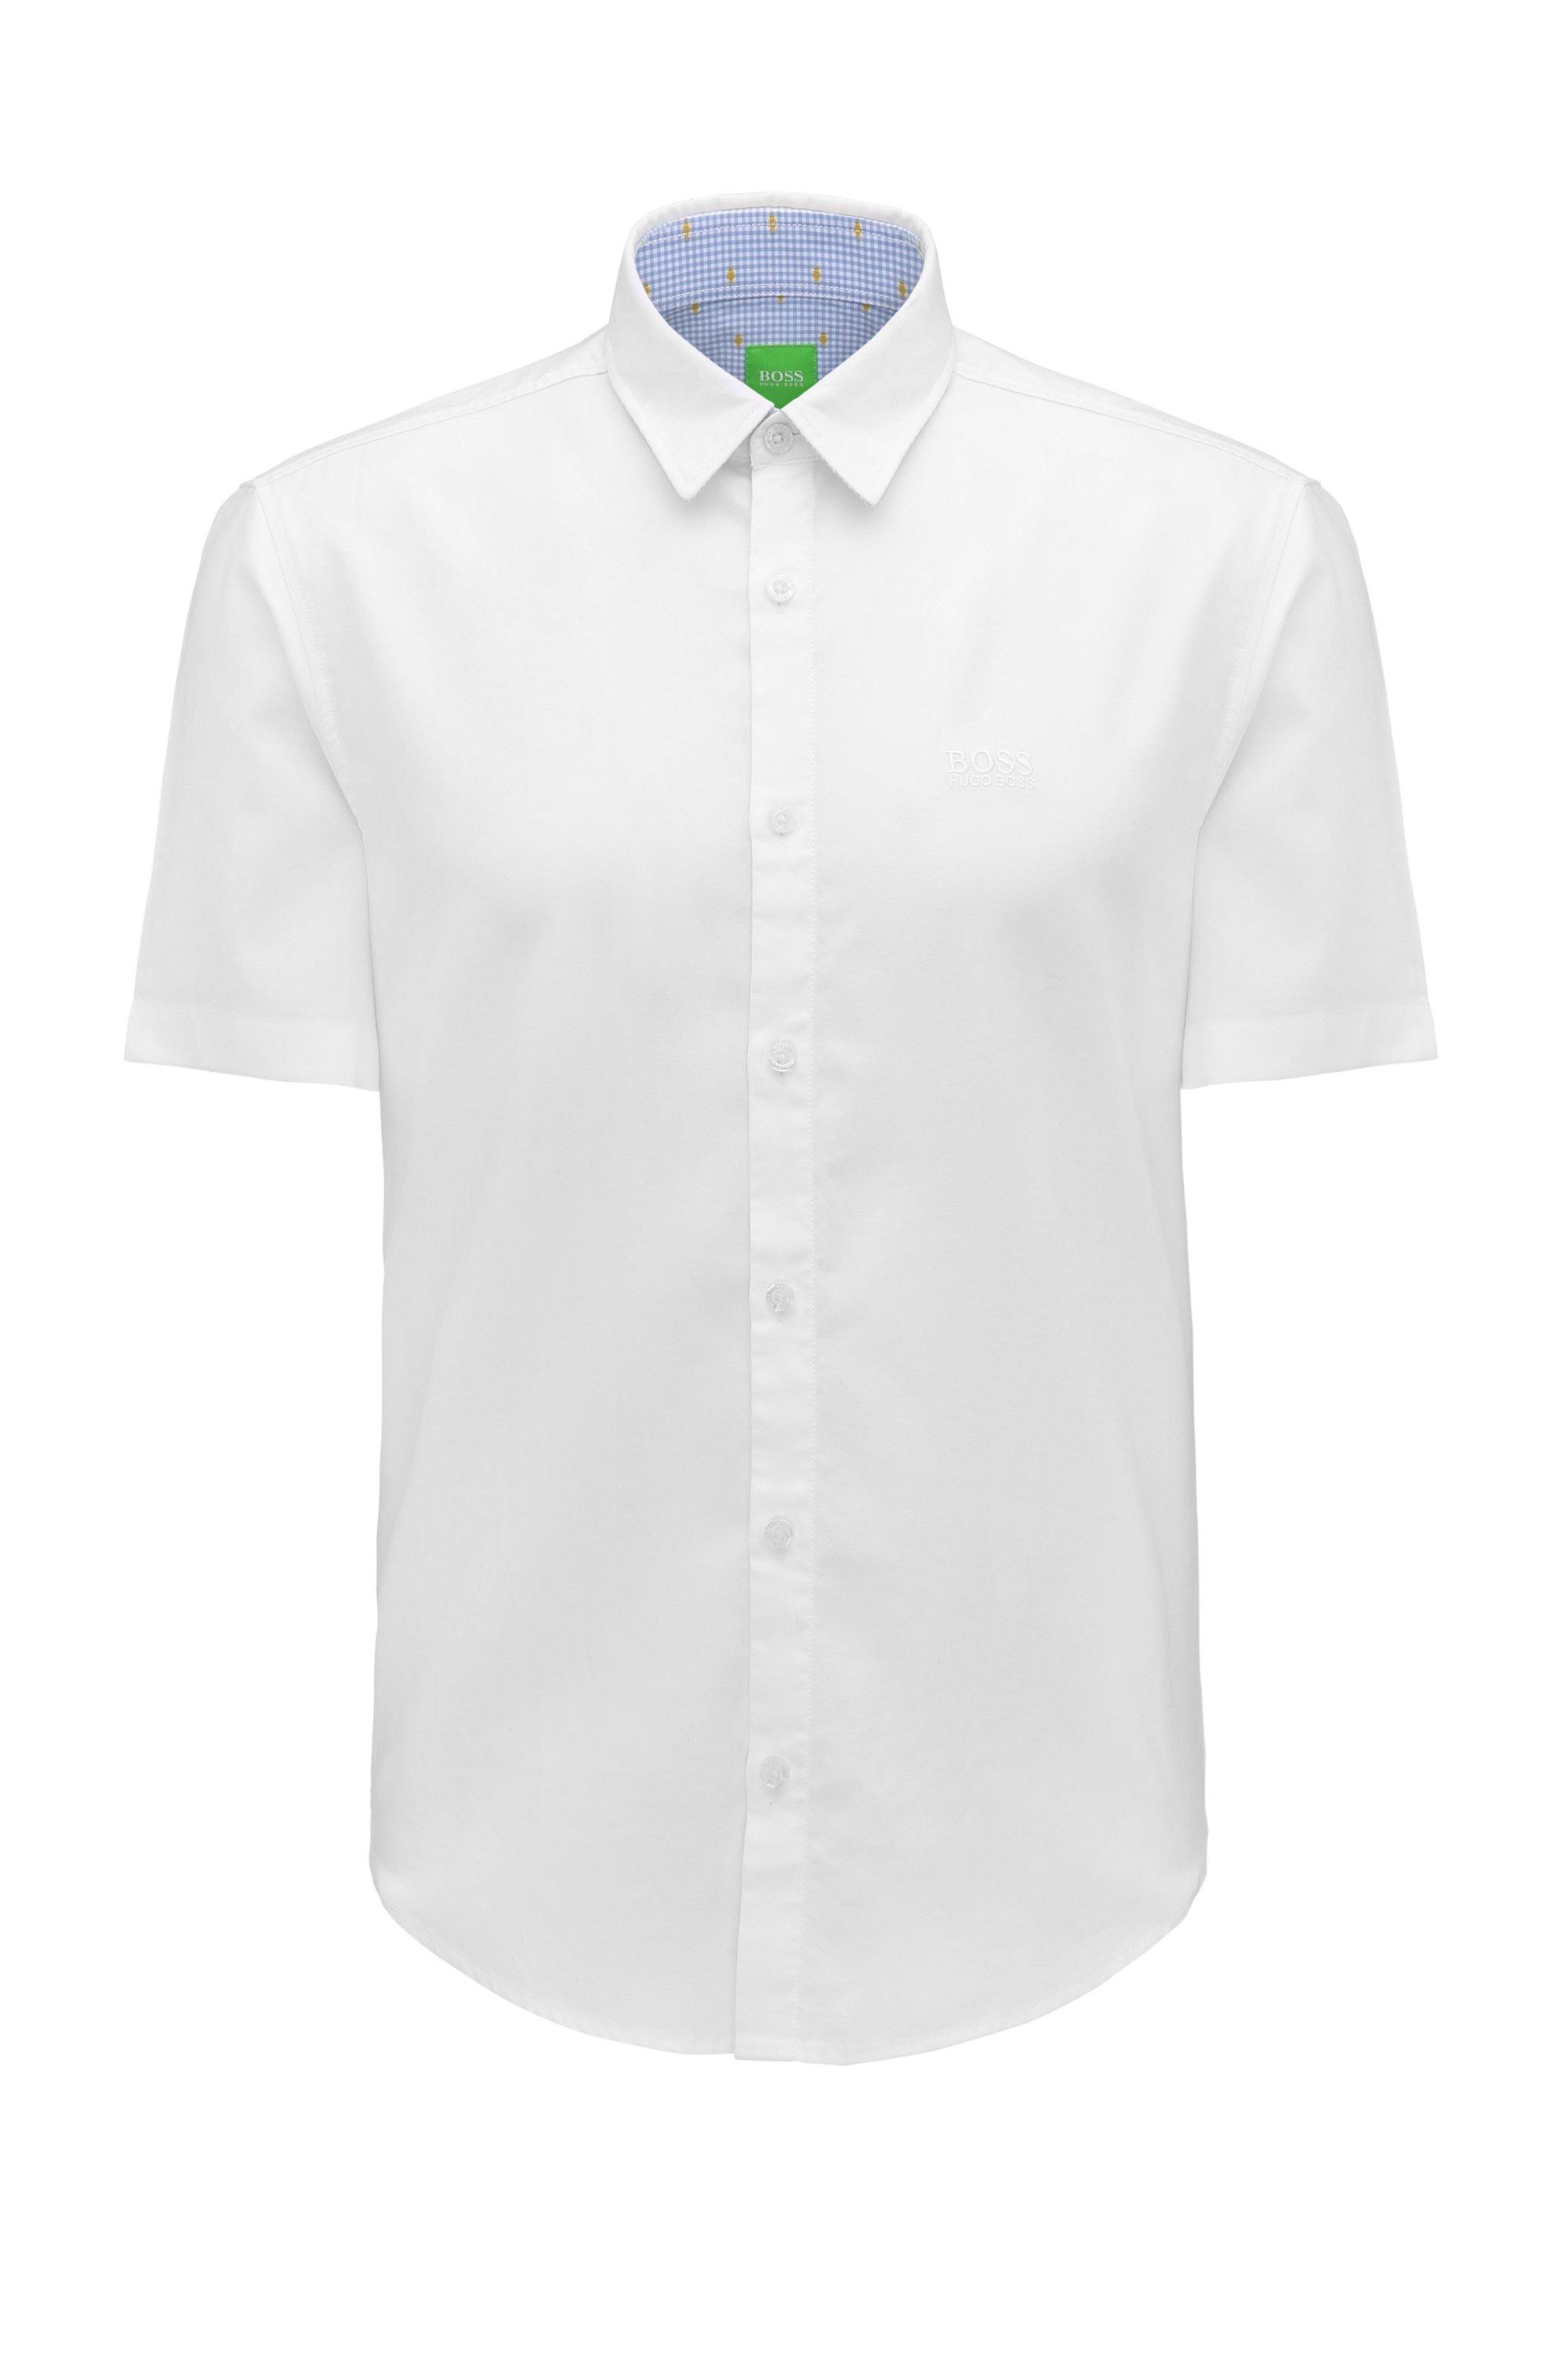 Regular-Fit Hemd aus Fil-à-Fil-Baumwolle, Weiß